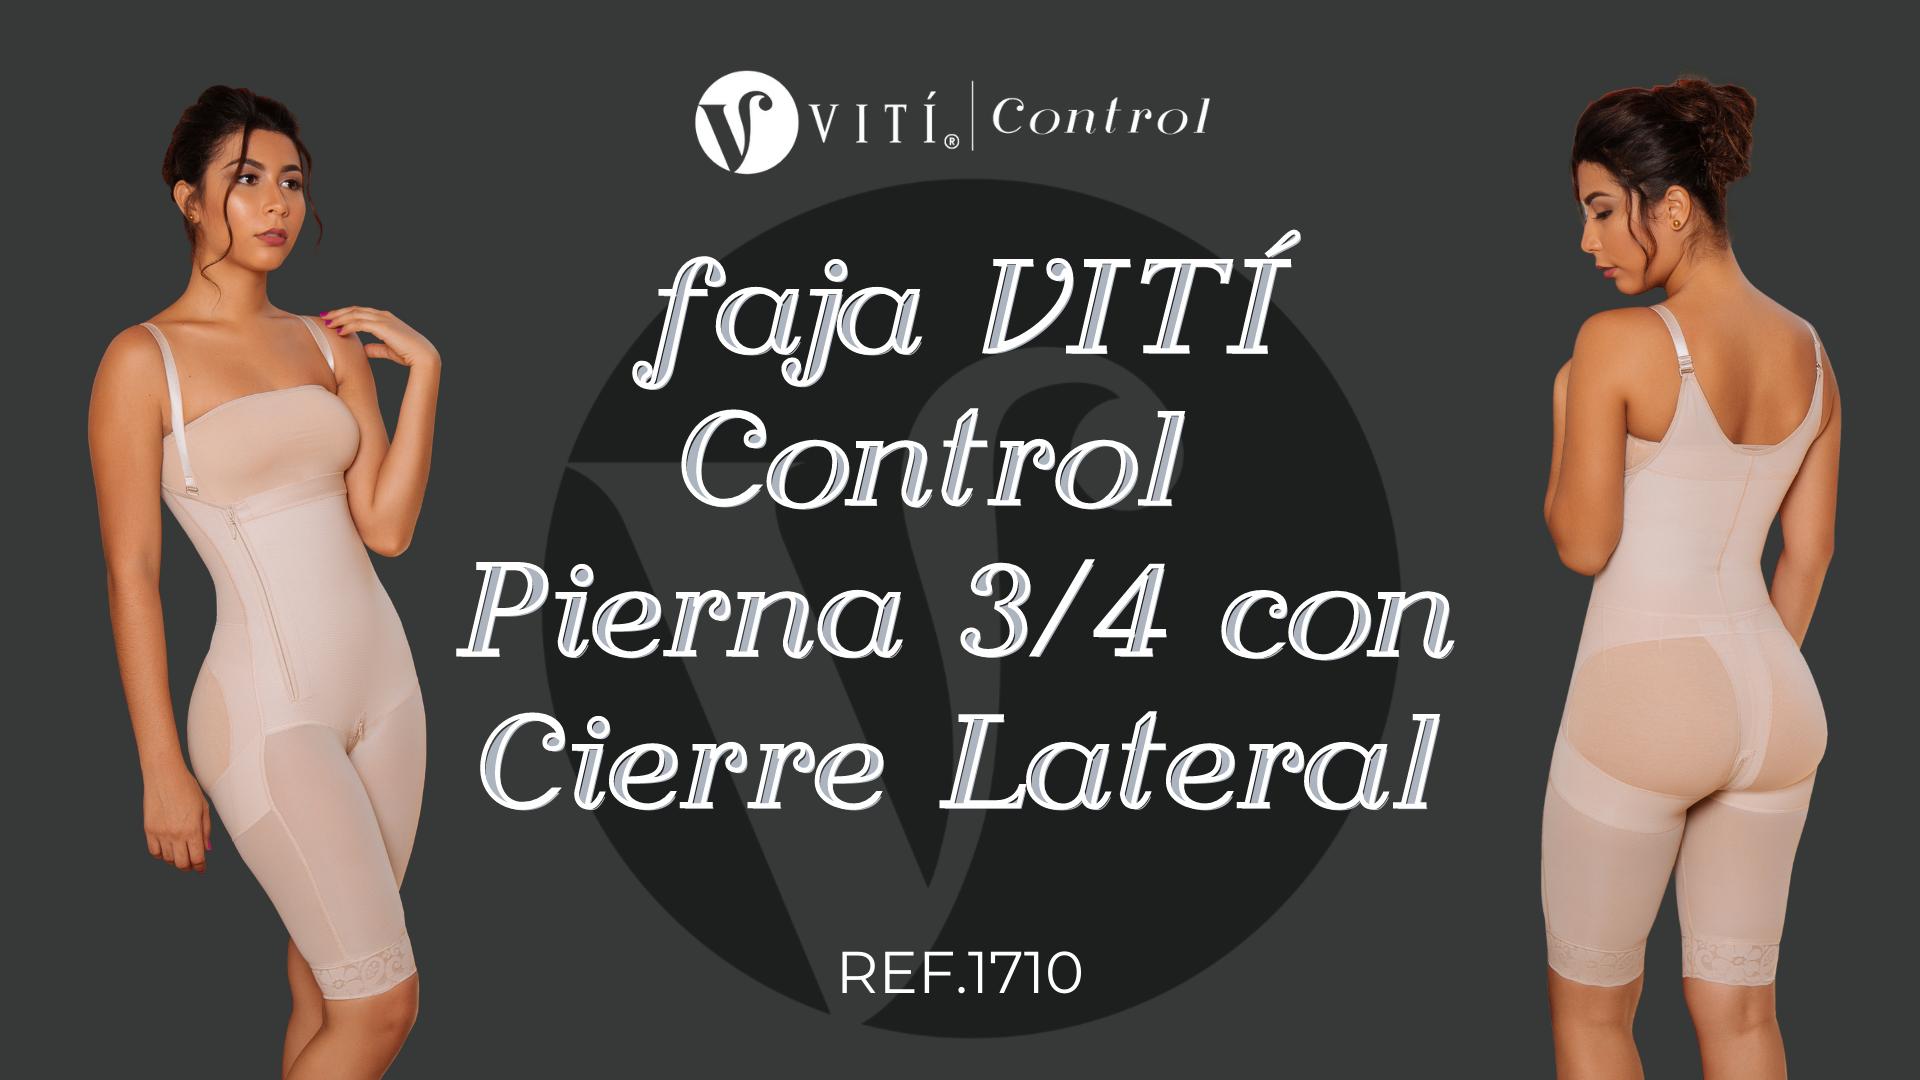 Blog-Faja-VITí-Control-Pierna-3/4-con-Cierre-Lateral